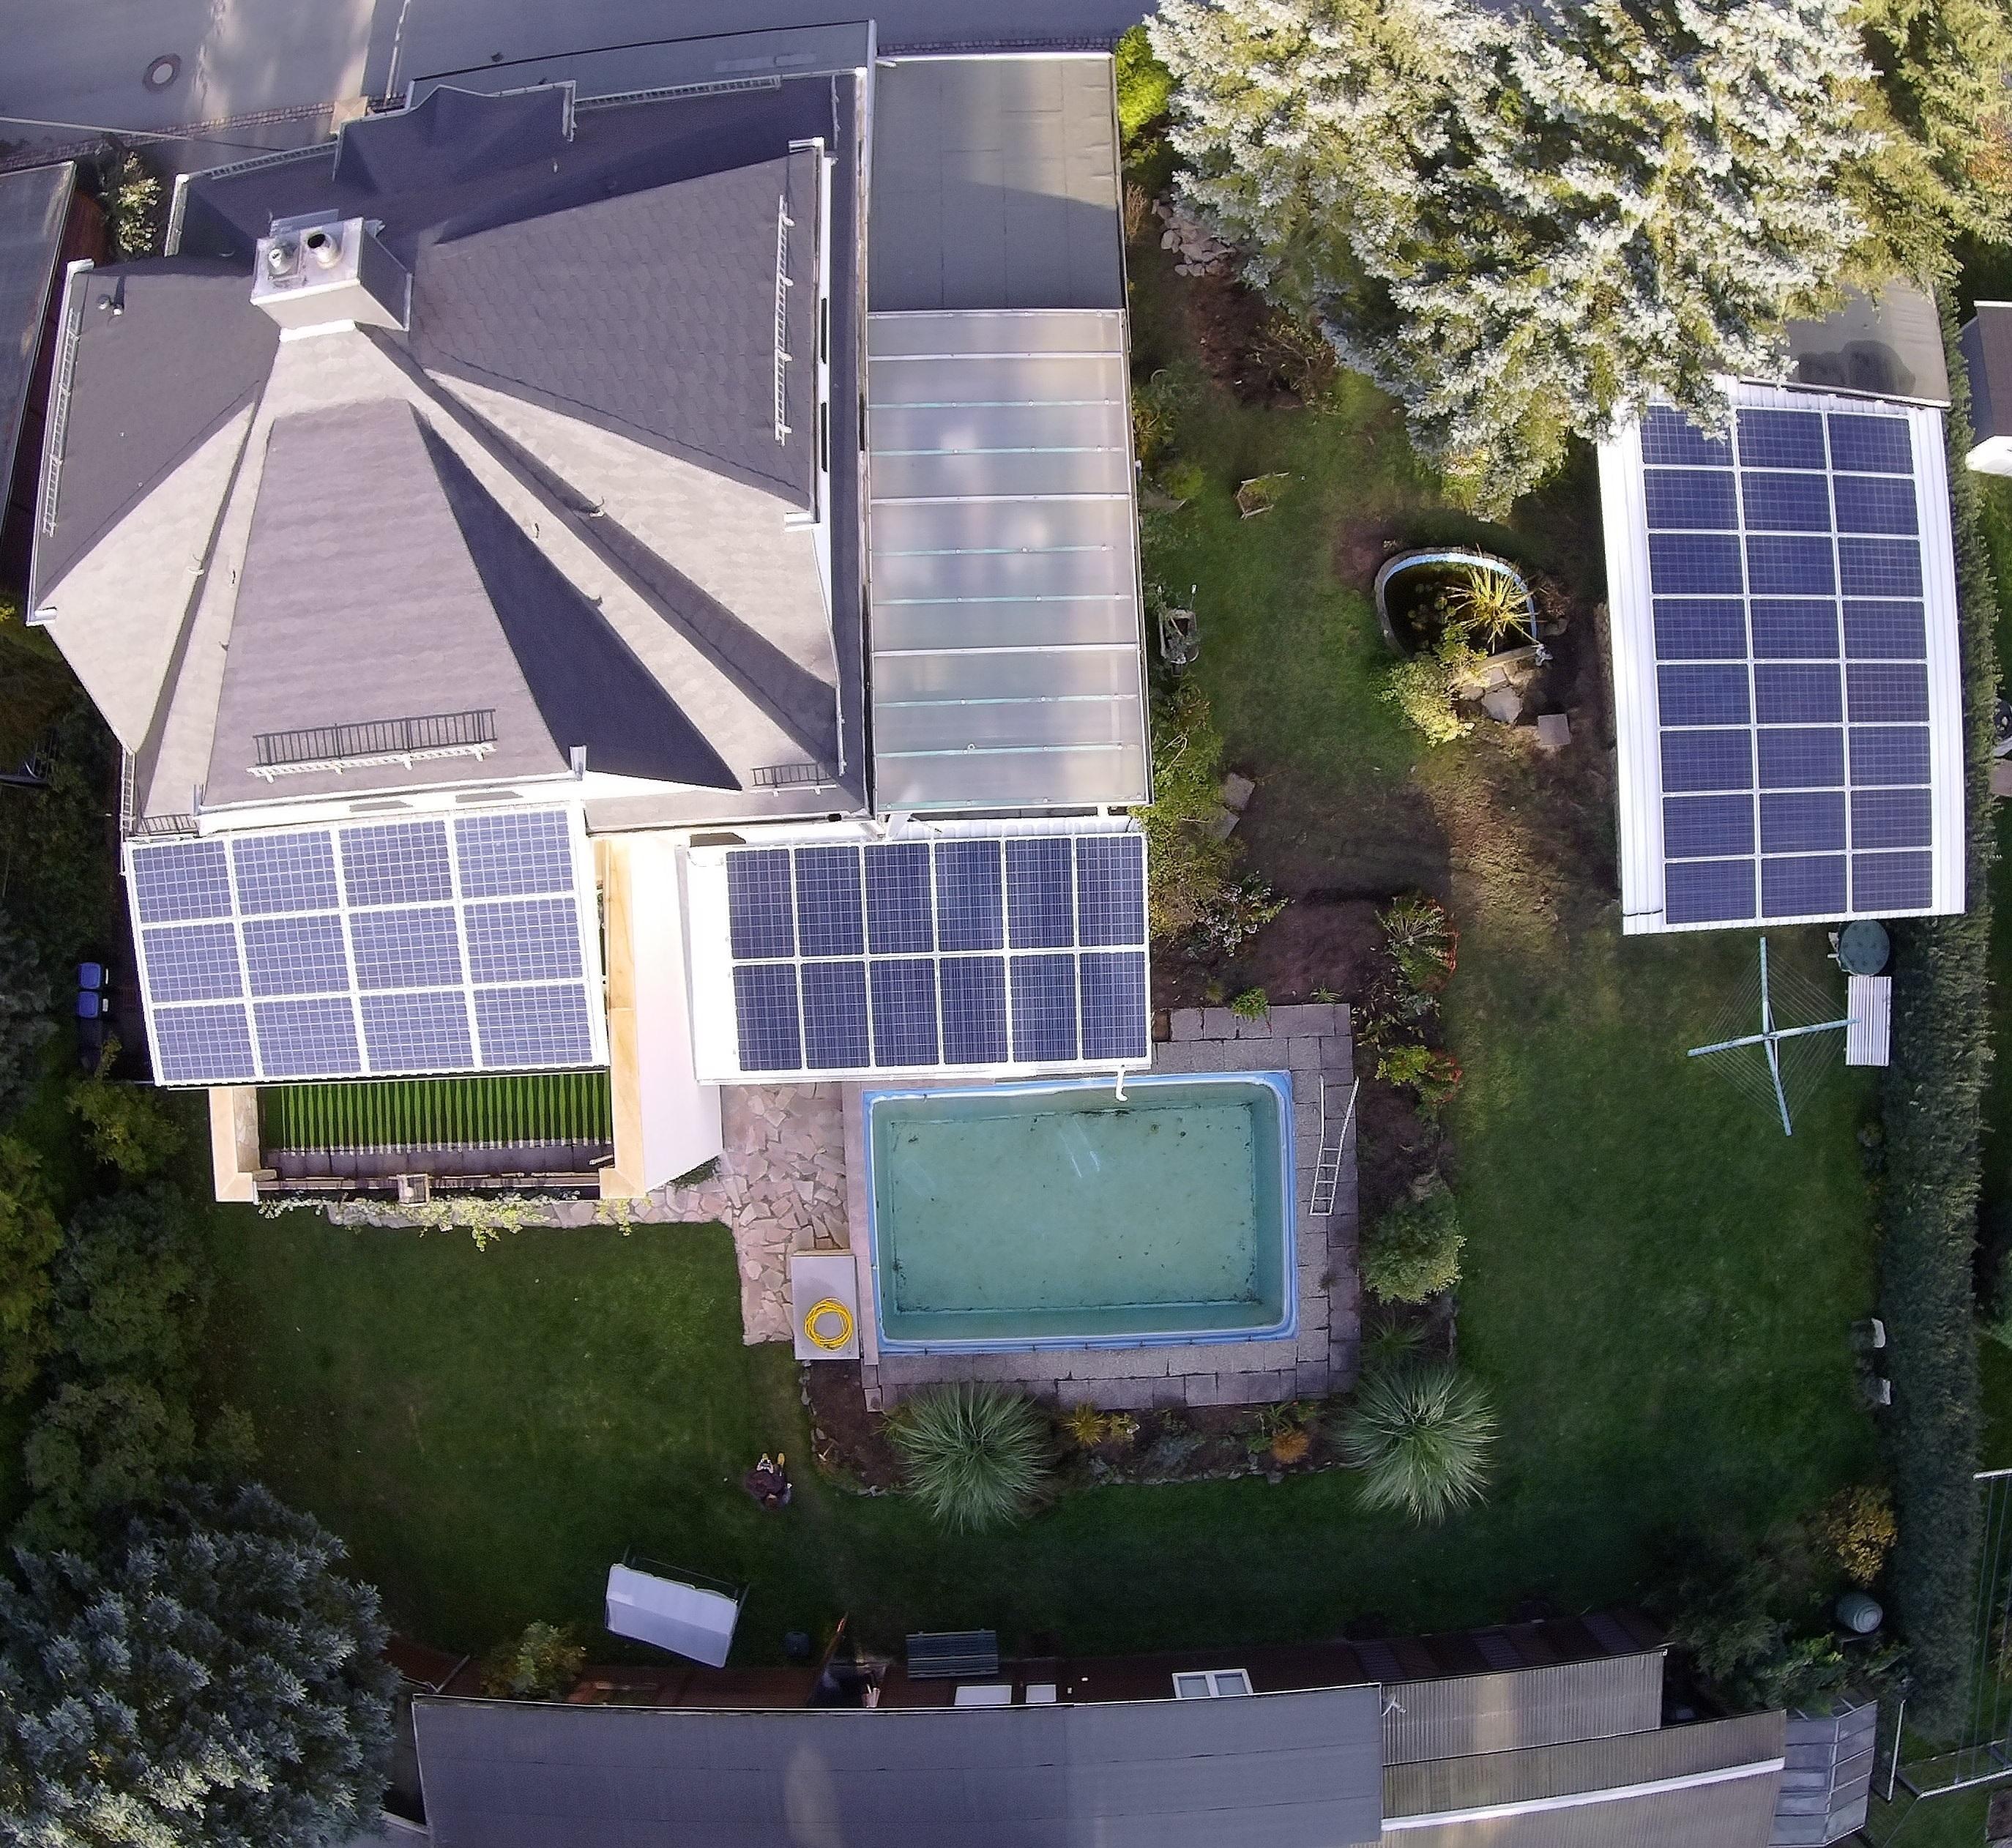 tisiba green energy photovoltaikanlage mit tesla speicher 9 54 kwp. Black Bedroom Furniture Sets. Home Design Ideas